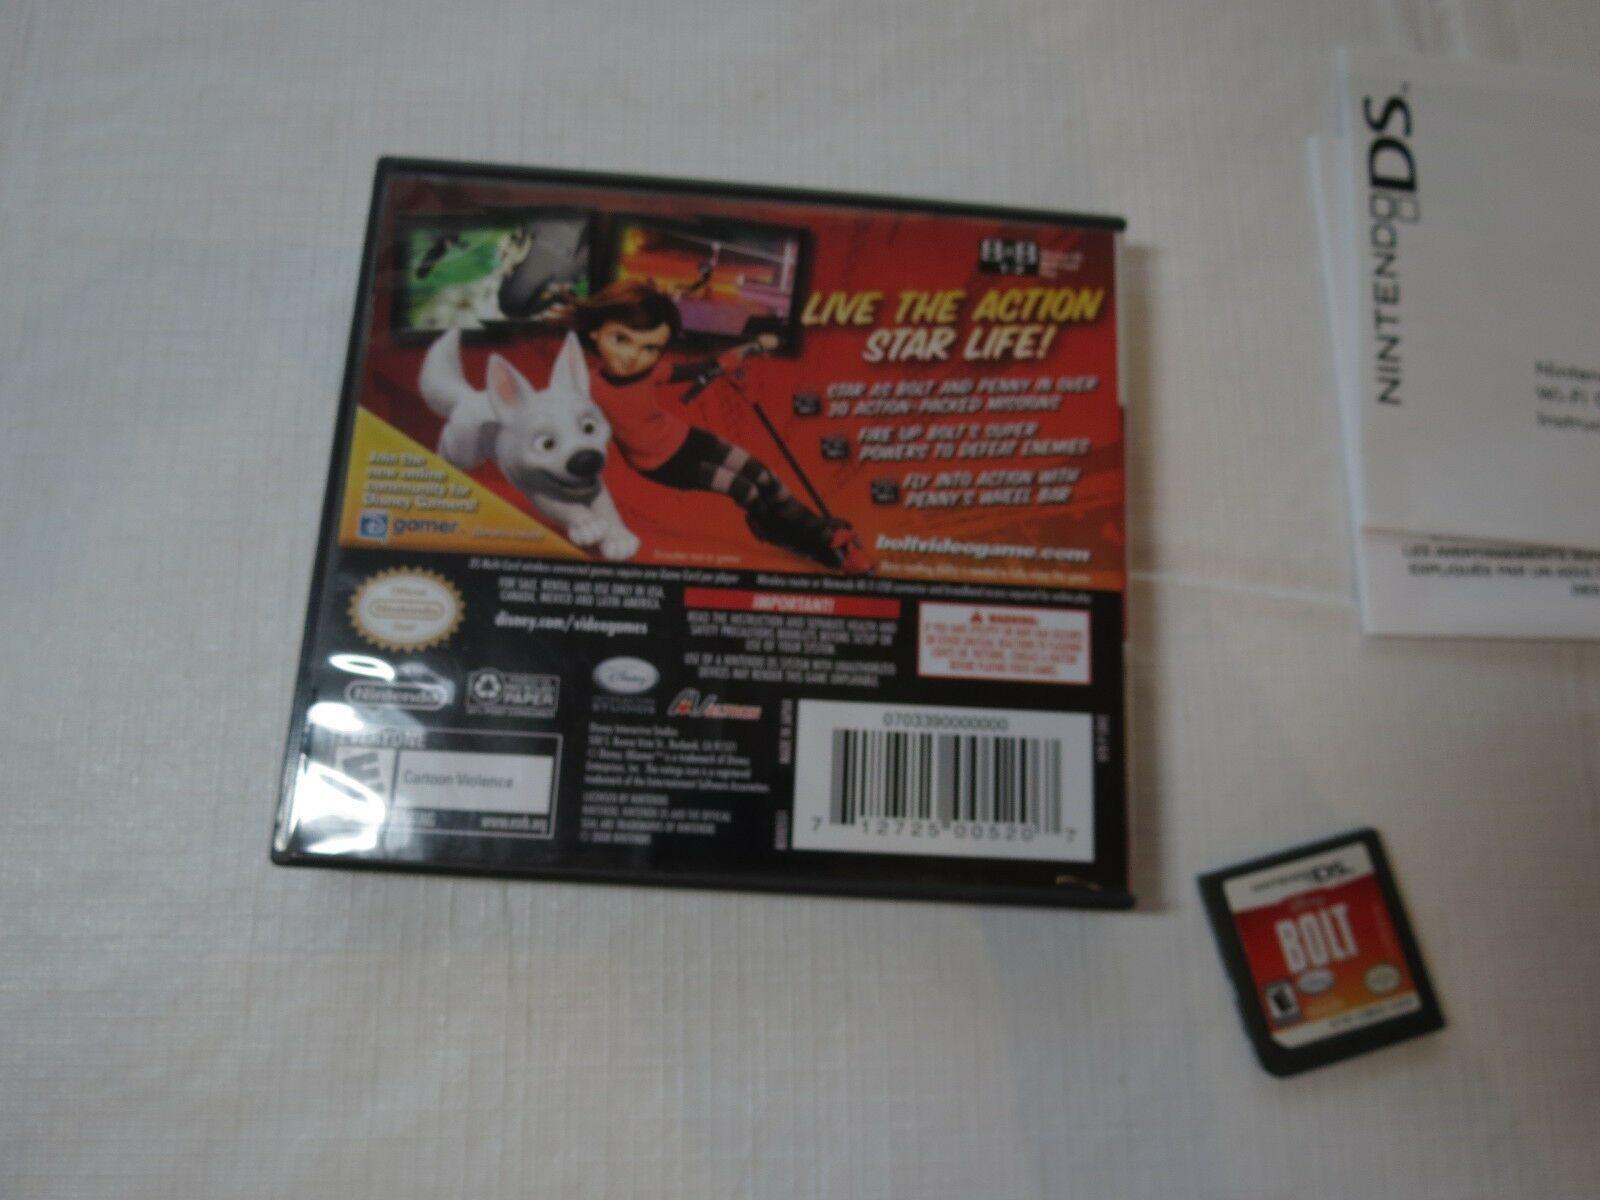 Bullone (Nintendo DS, 2008) Walt Disney Game Boy Tutti Immagini Gamer